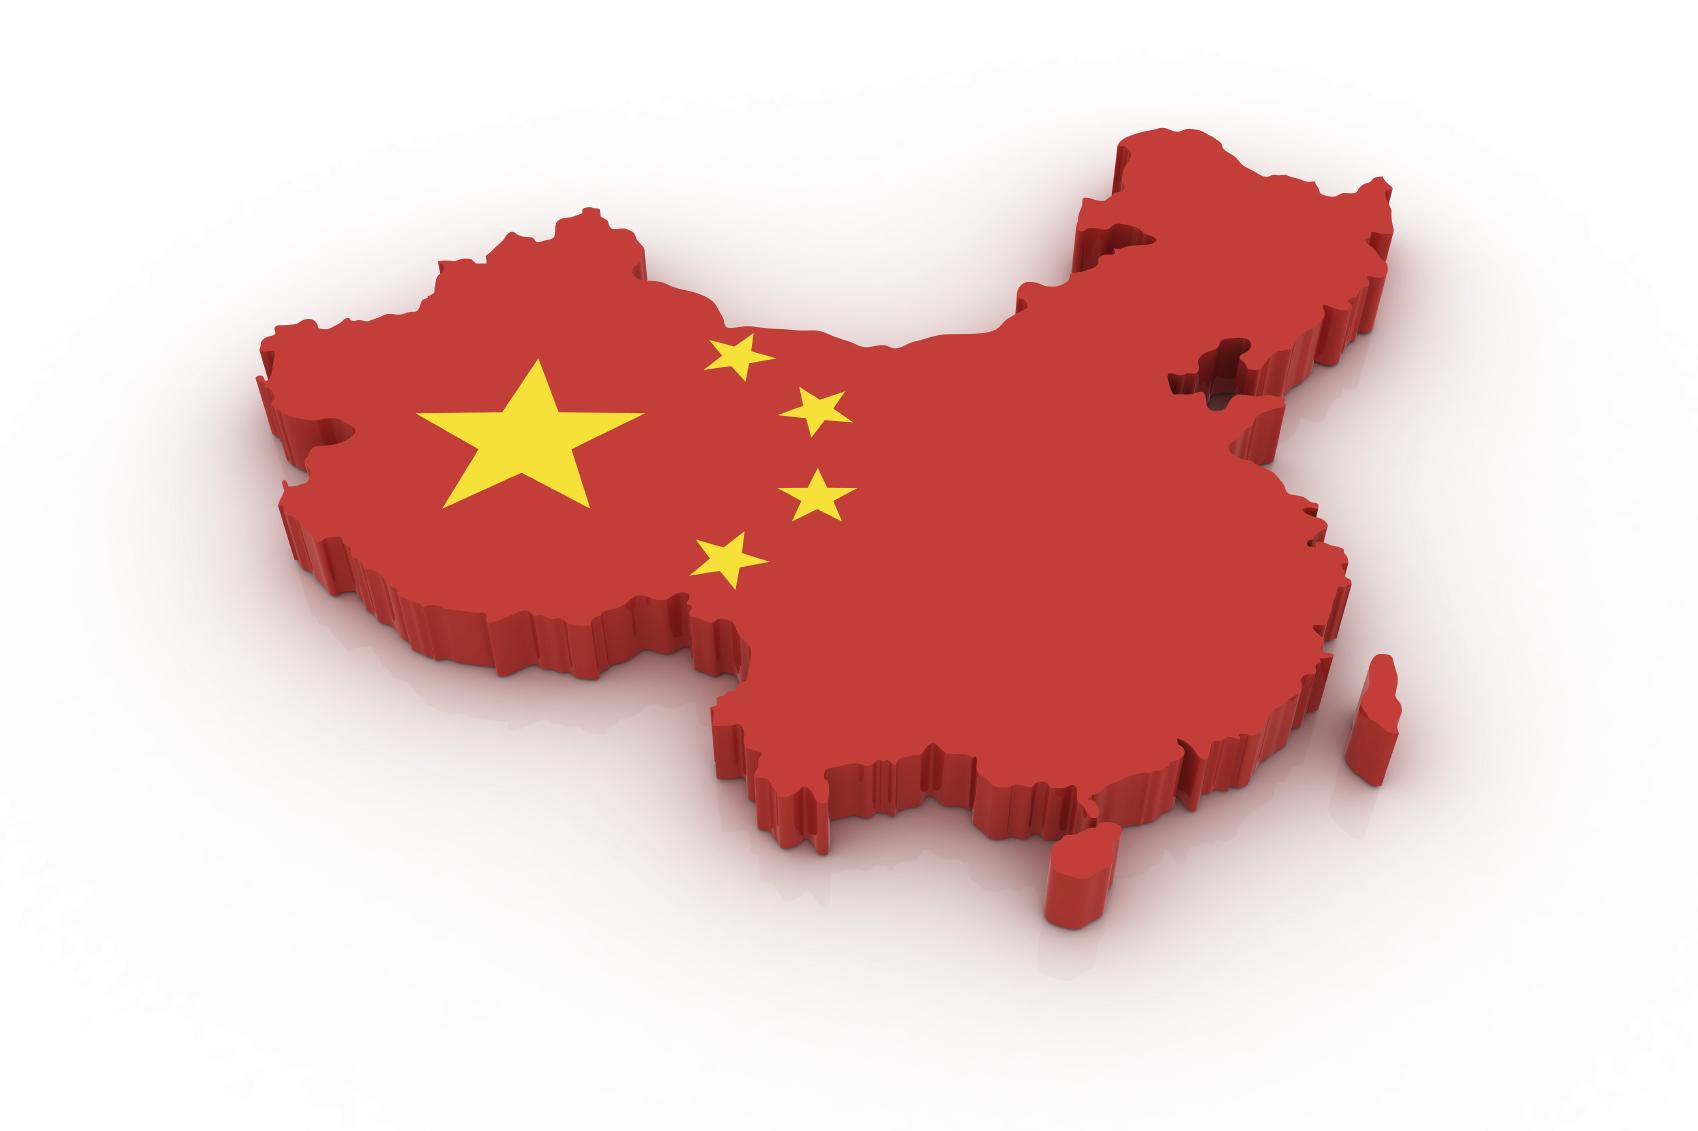 Hd wallpapers and photos. China clipart china travel